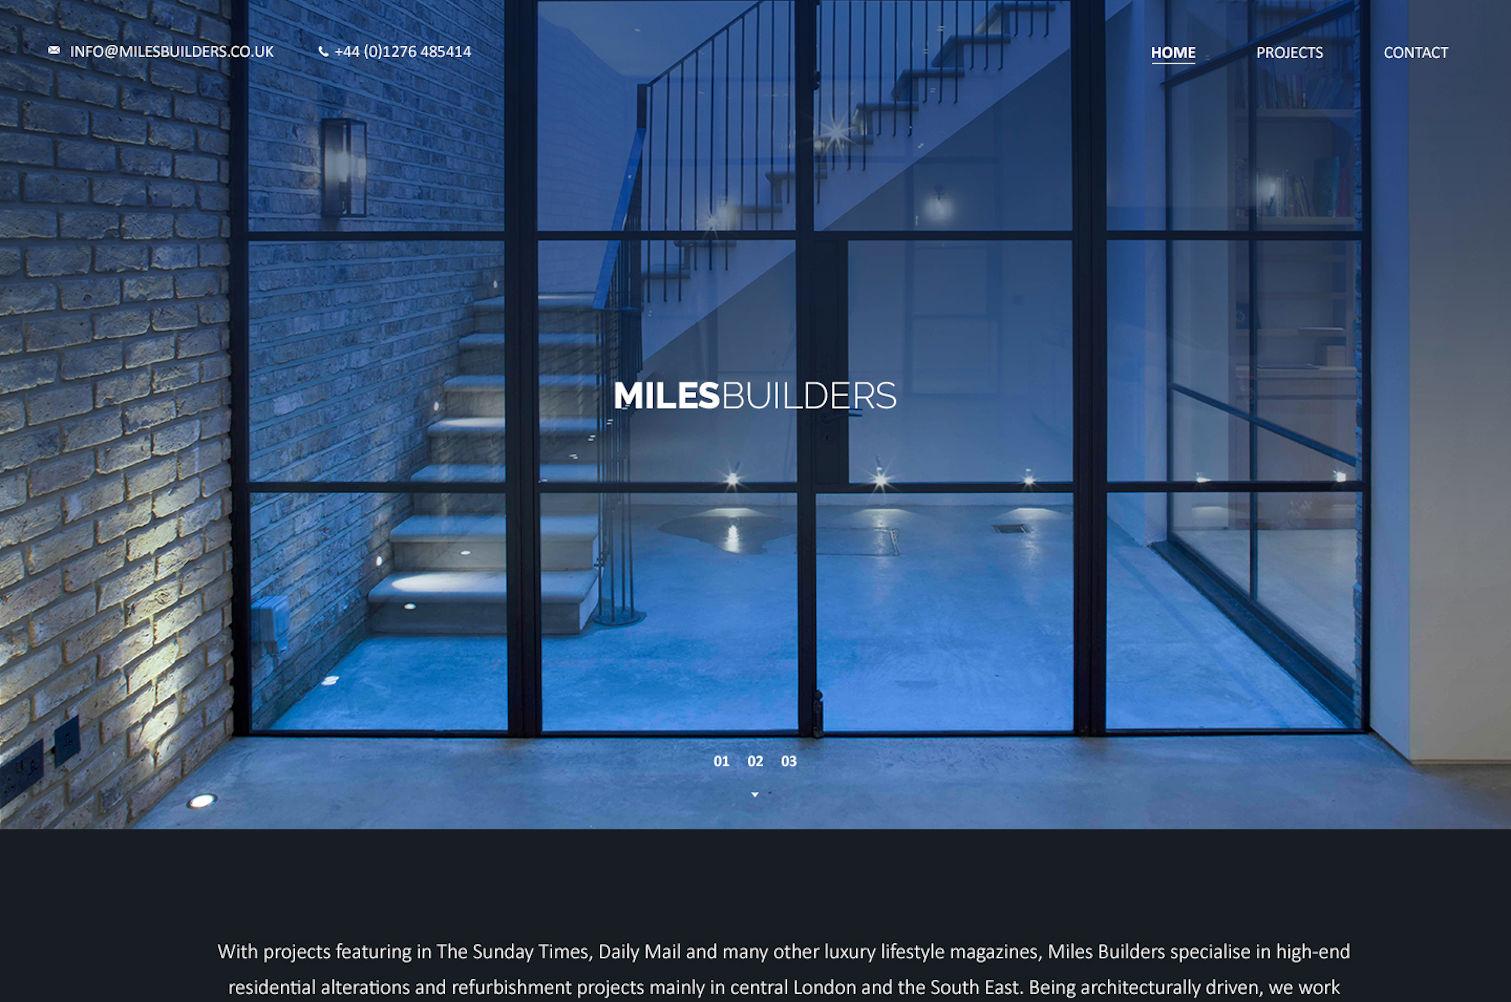 Web Design Guildford - By Cude Design